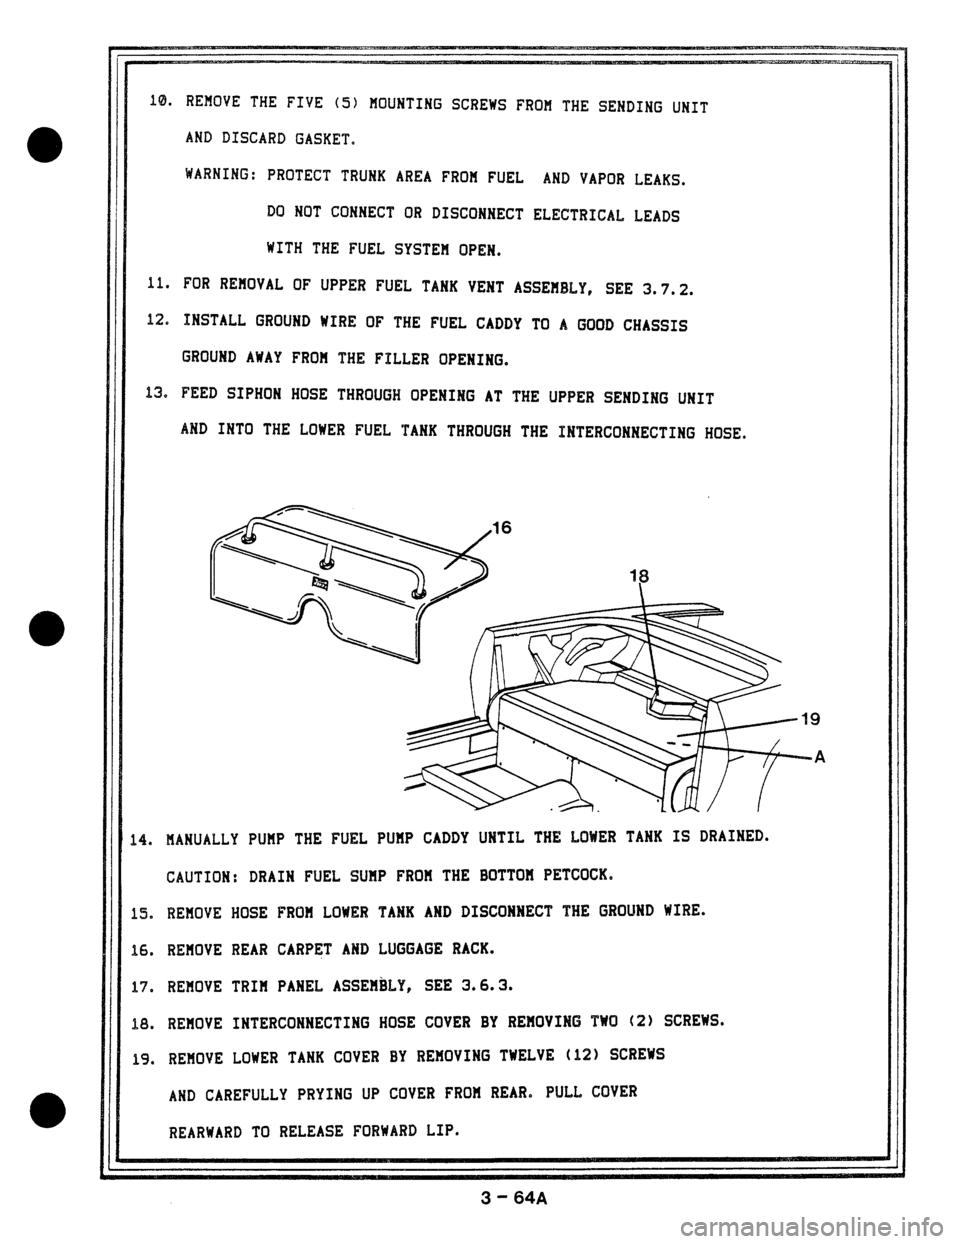 Jaguar Xjs Fuel Tank Wiring Diagram Trusted Diagrams Kia Sedona 1978 1 G Workshop Manual 1994 Xj6 Linkage